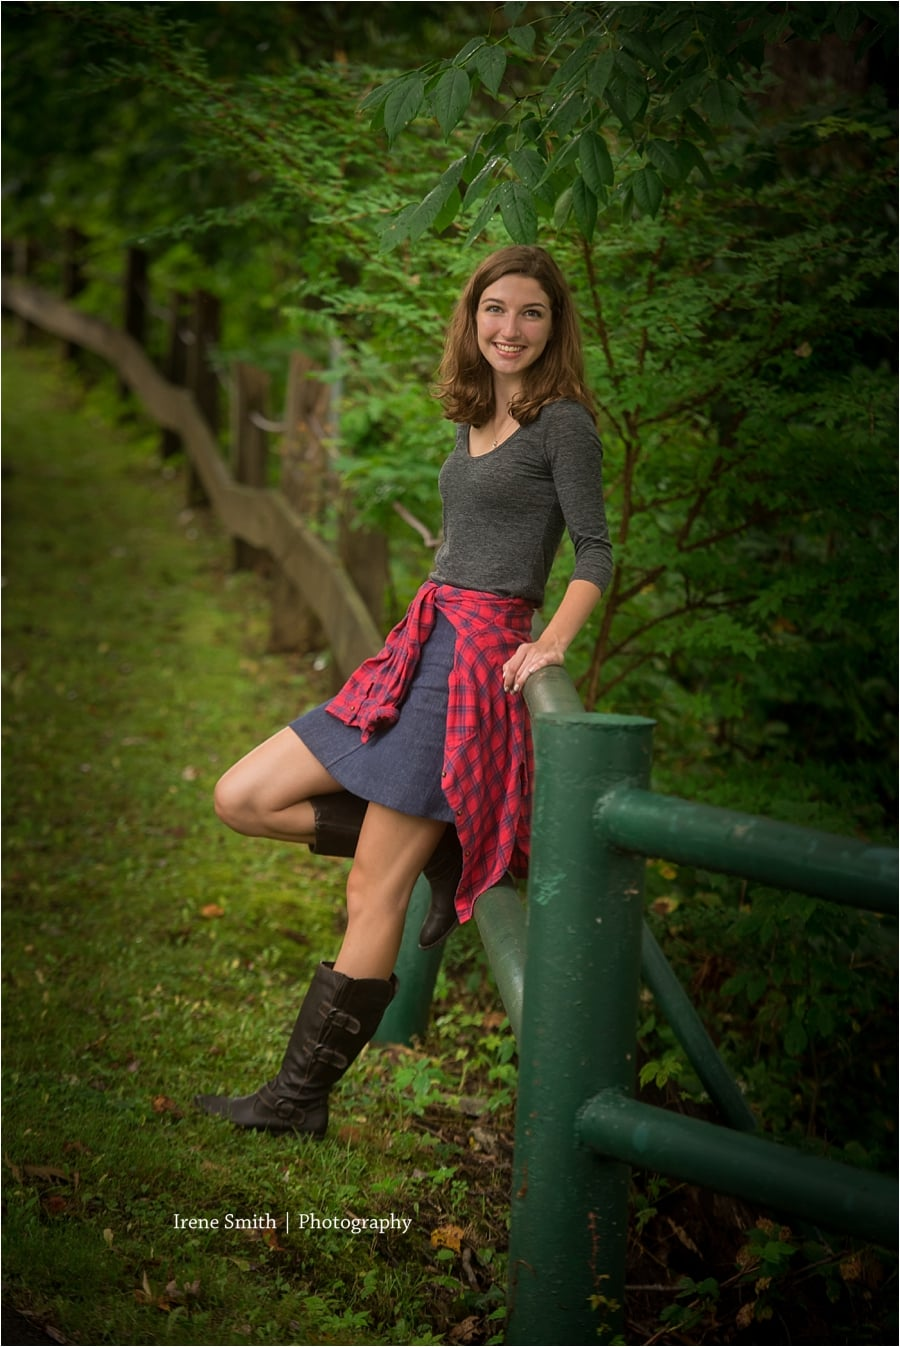 Oil-City-Pennsylvania-Senior-Photographer-Irene-Smith_0010.jpg